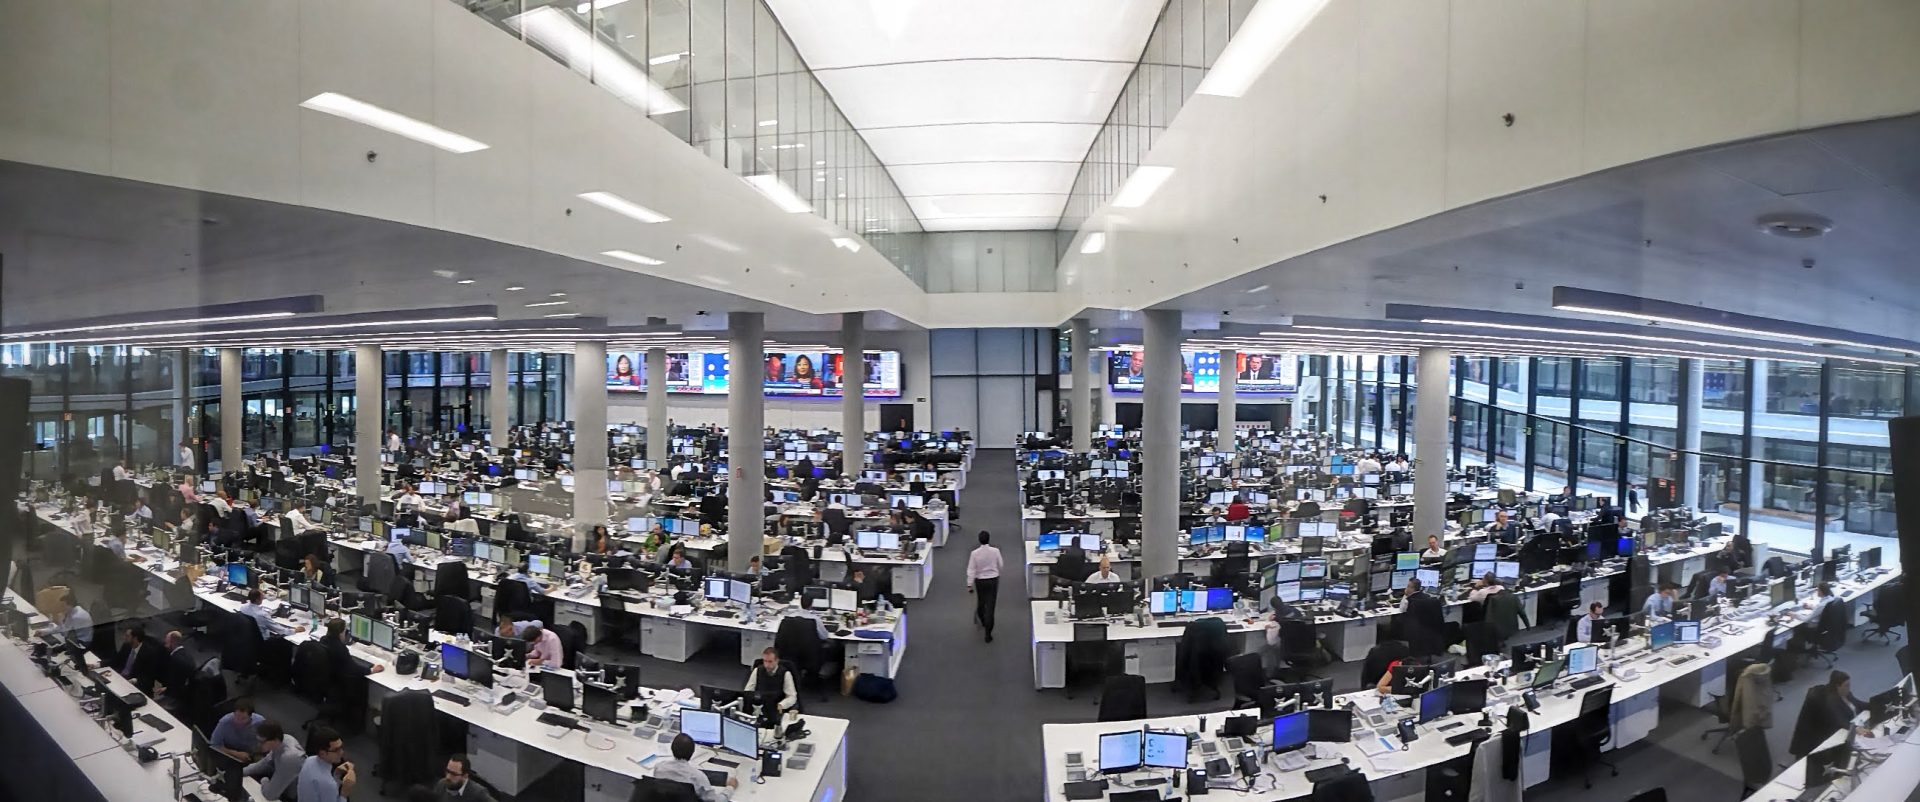 BBVA Trading floor